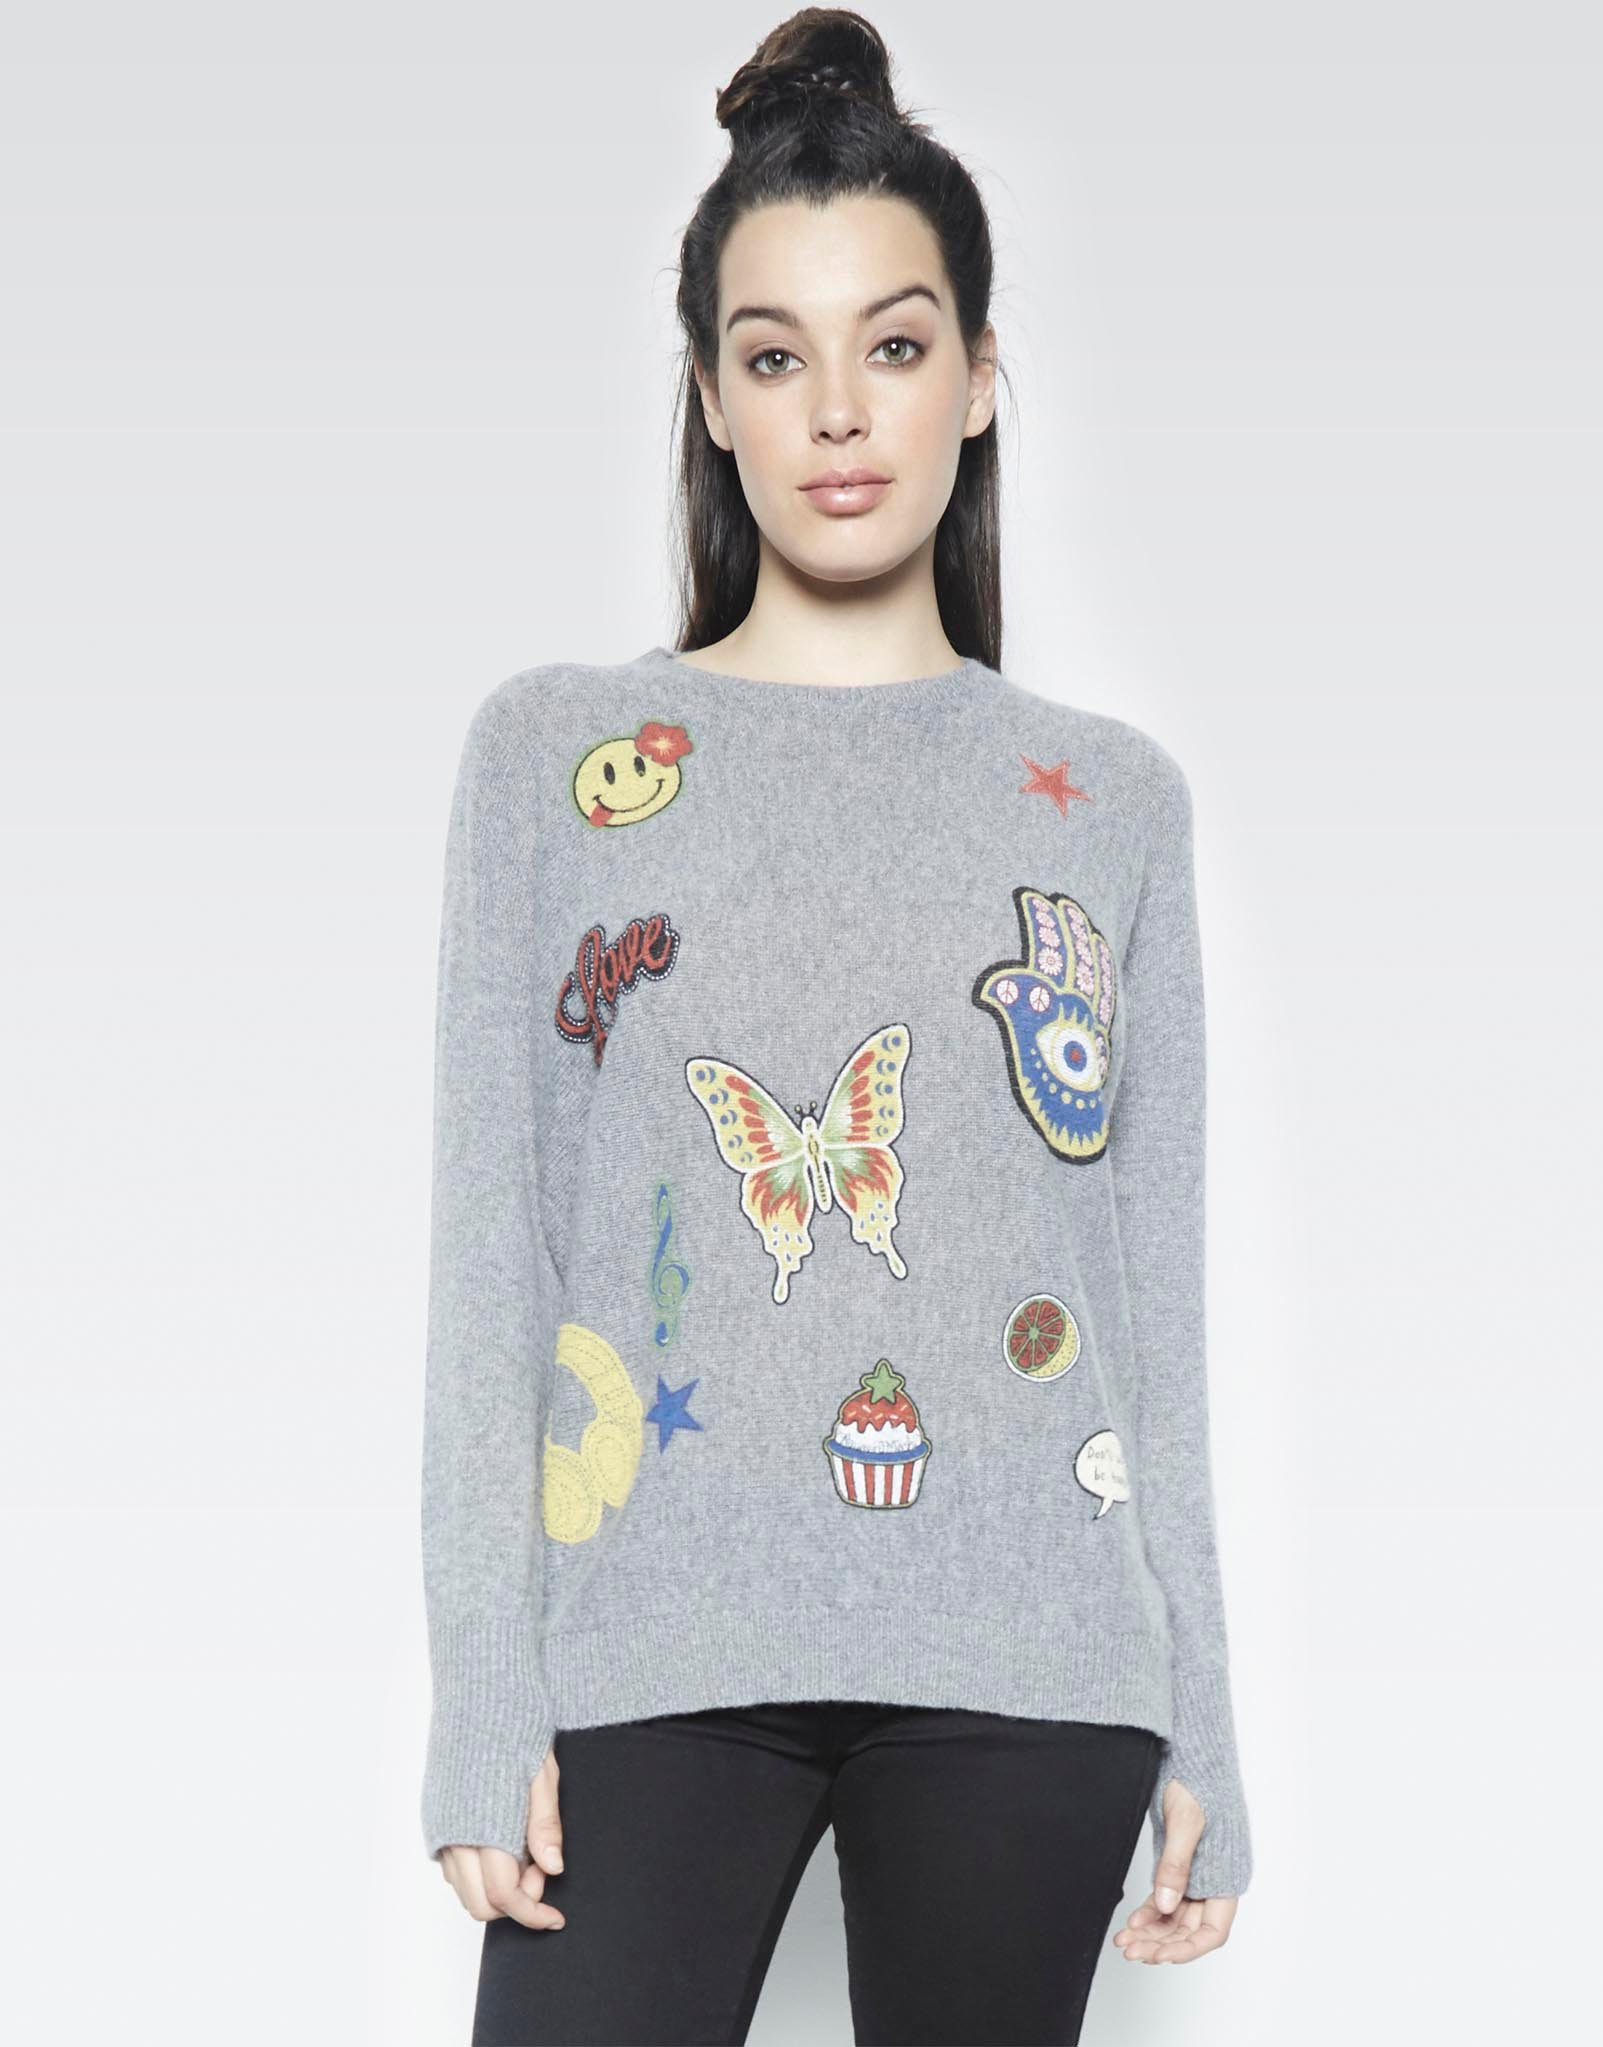 Womens Shirts with Thumb Holes | Thumbhole Sweater | Kids Jackets with Thumb Holes